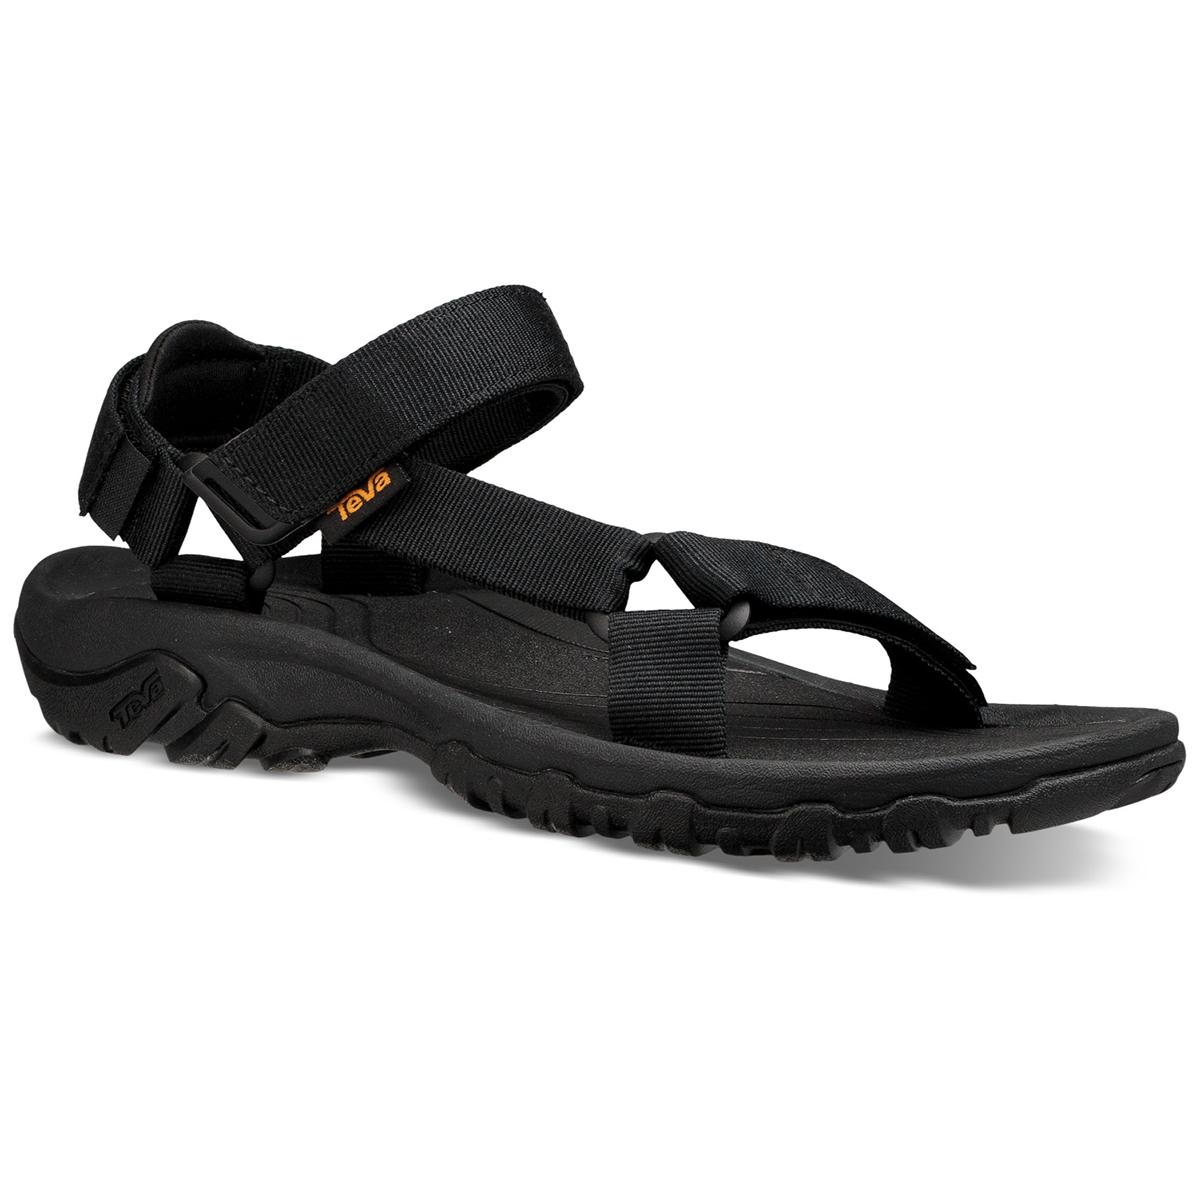 TEVA Men's Hurricane 4 Sandals - Bob's